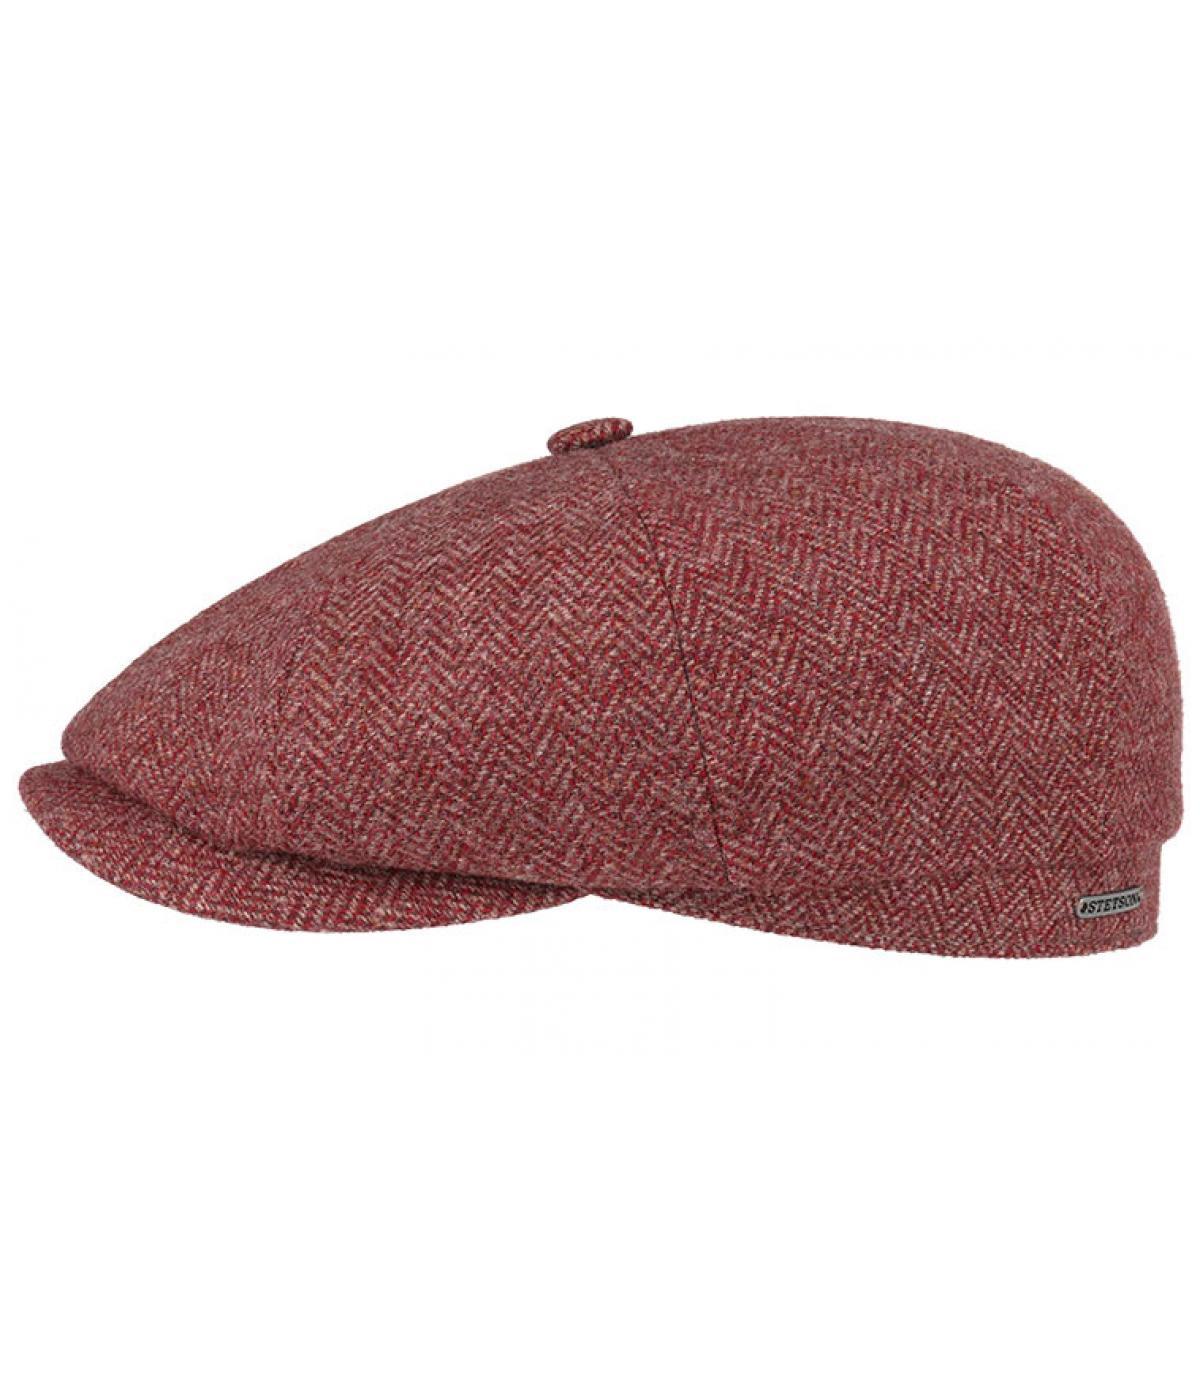 df05d5fd6bb burgundy newsboy cap wool - Hatteras Woolrich Herringbone bordeaux Stetson  - image 1 ...